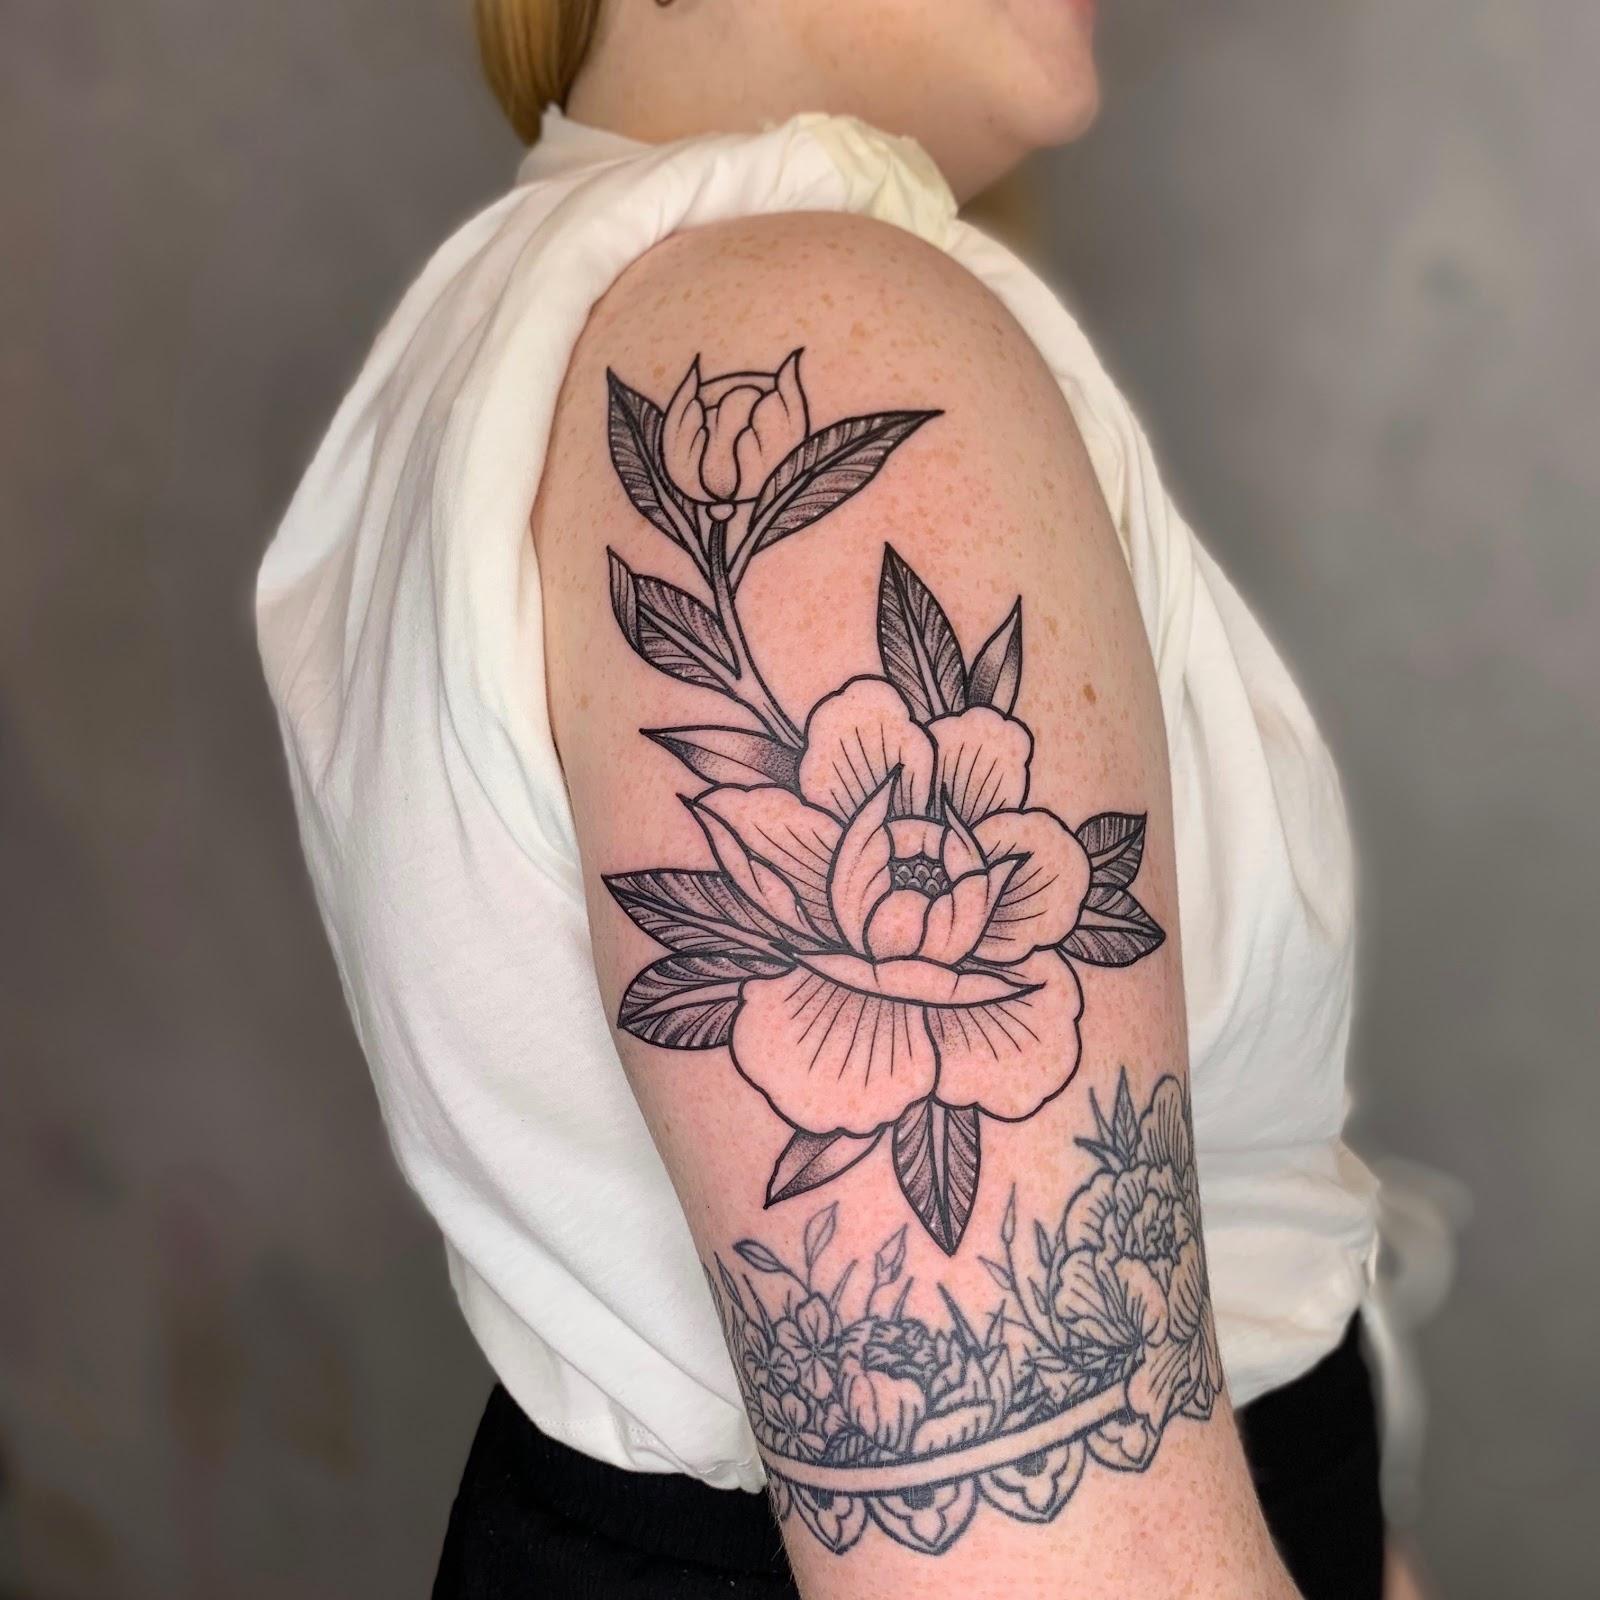 Buzz Club Tattoo Studio Top 5 Unique Traditional Flower Tattoos Tattoo Shop Leeds